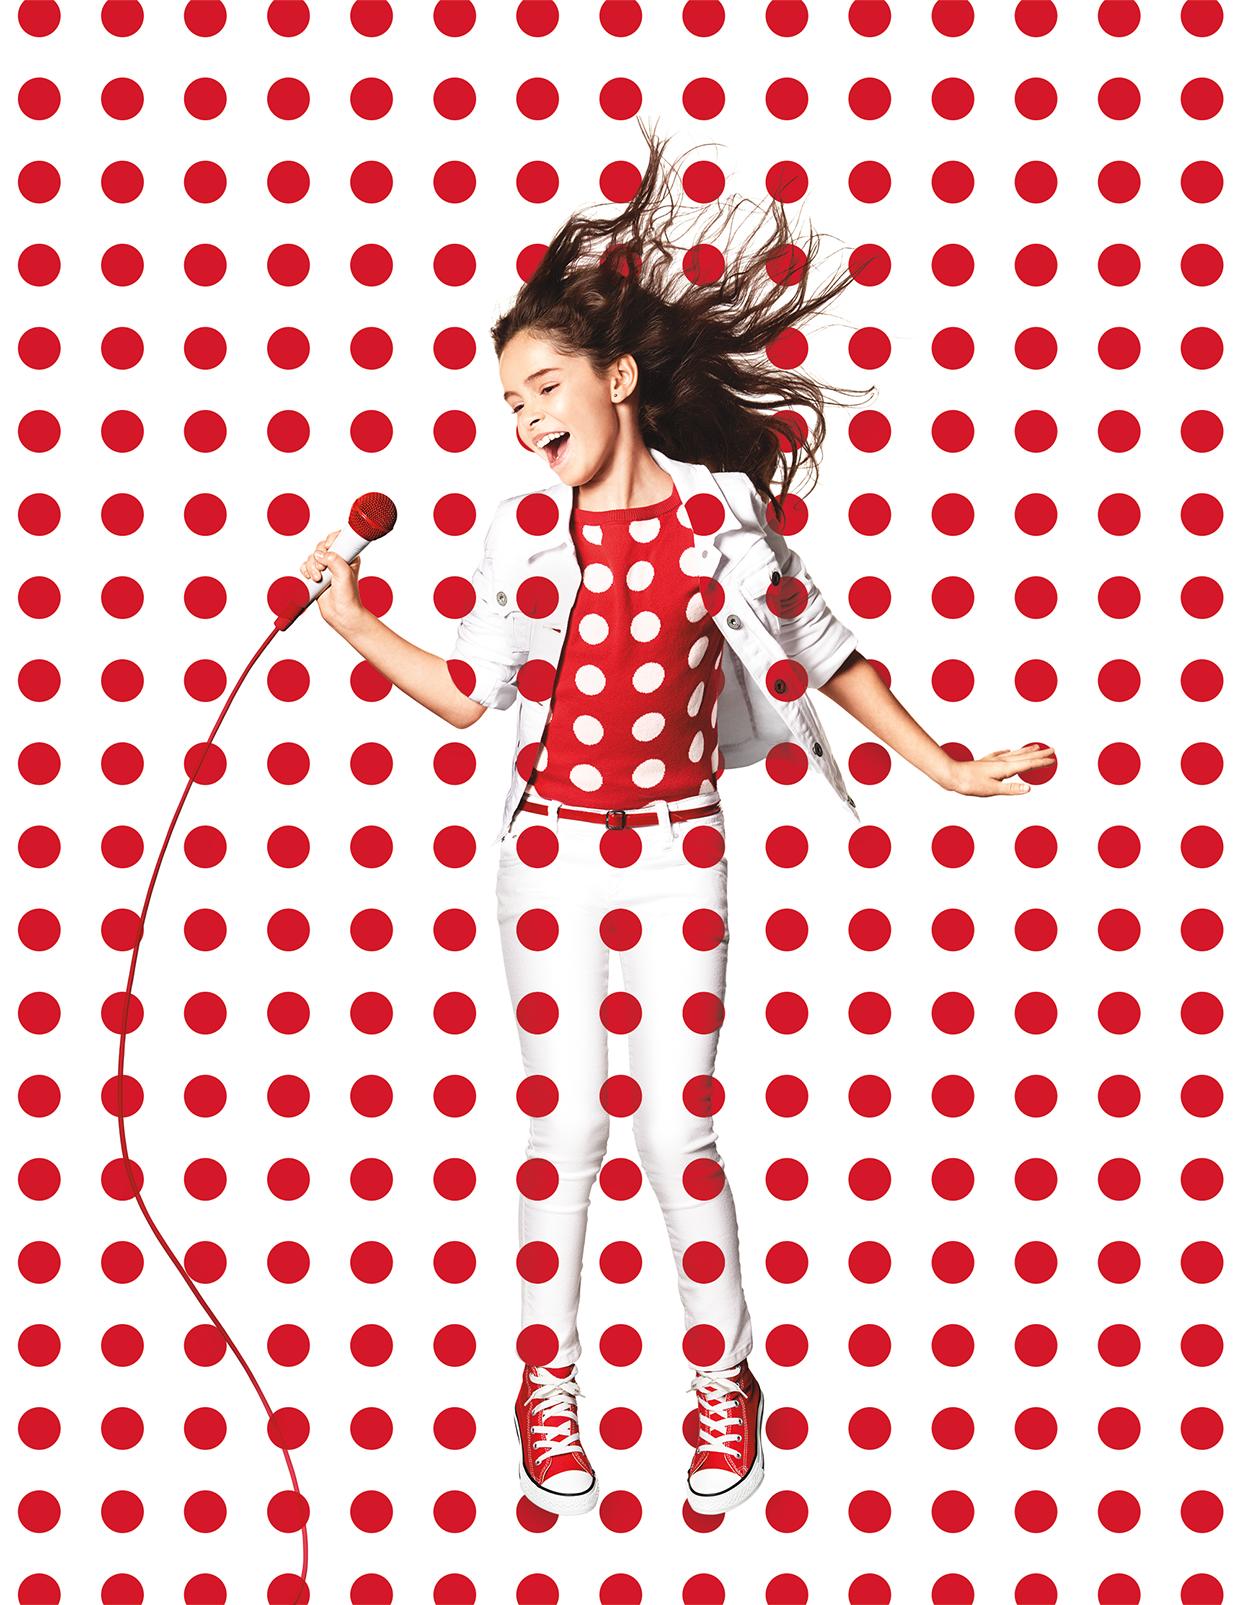 Target's logo is elegantly simple. One dot. One ring.